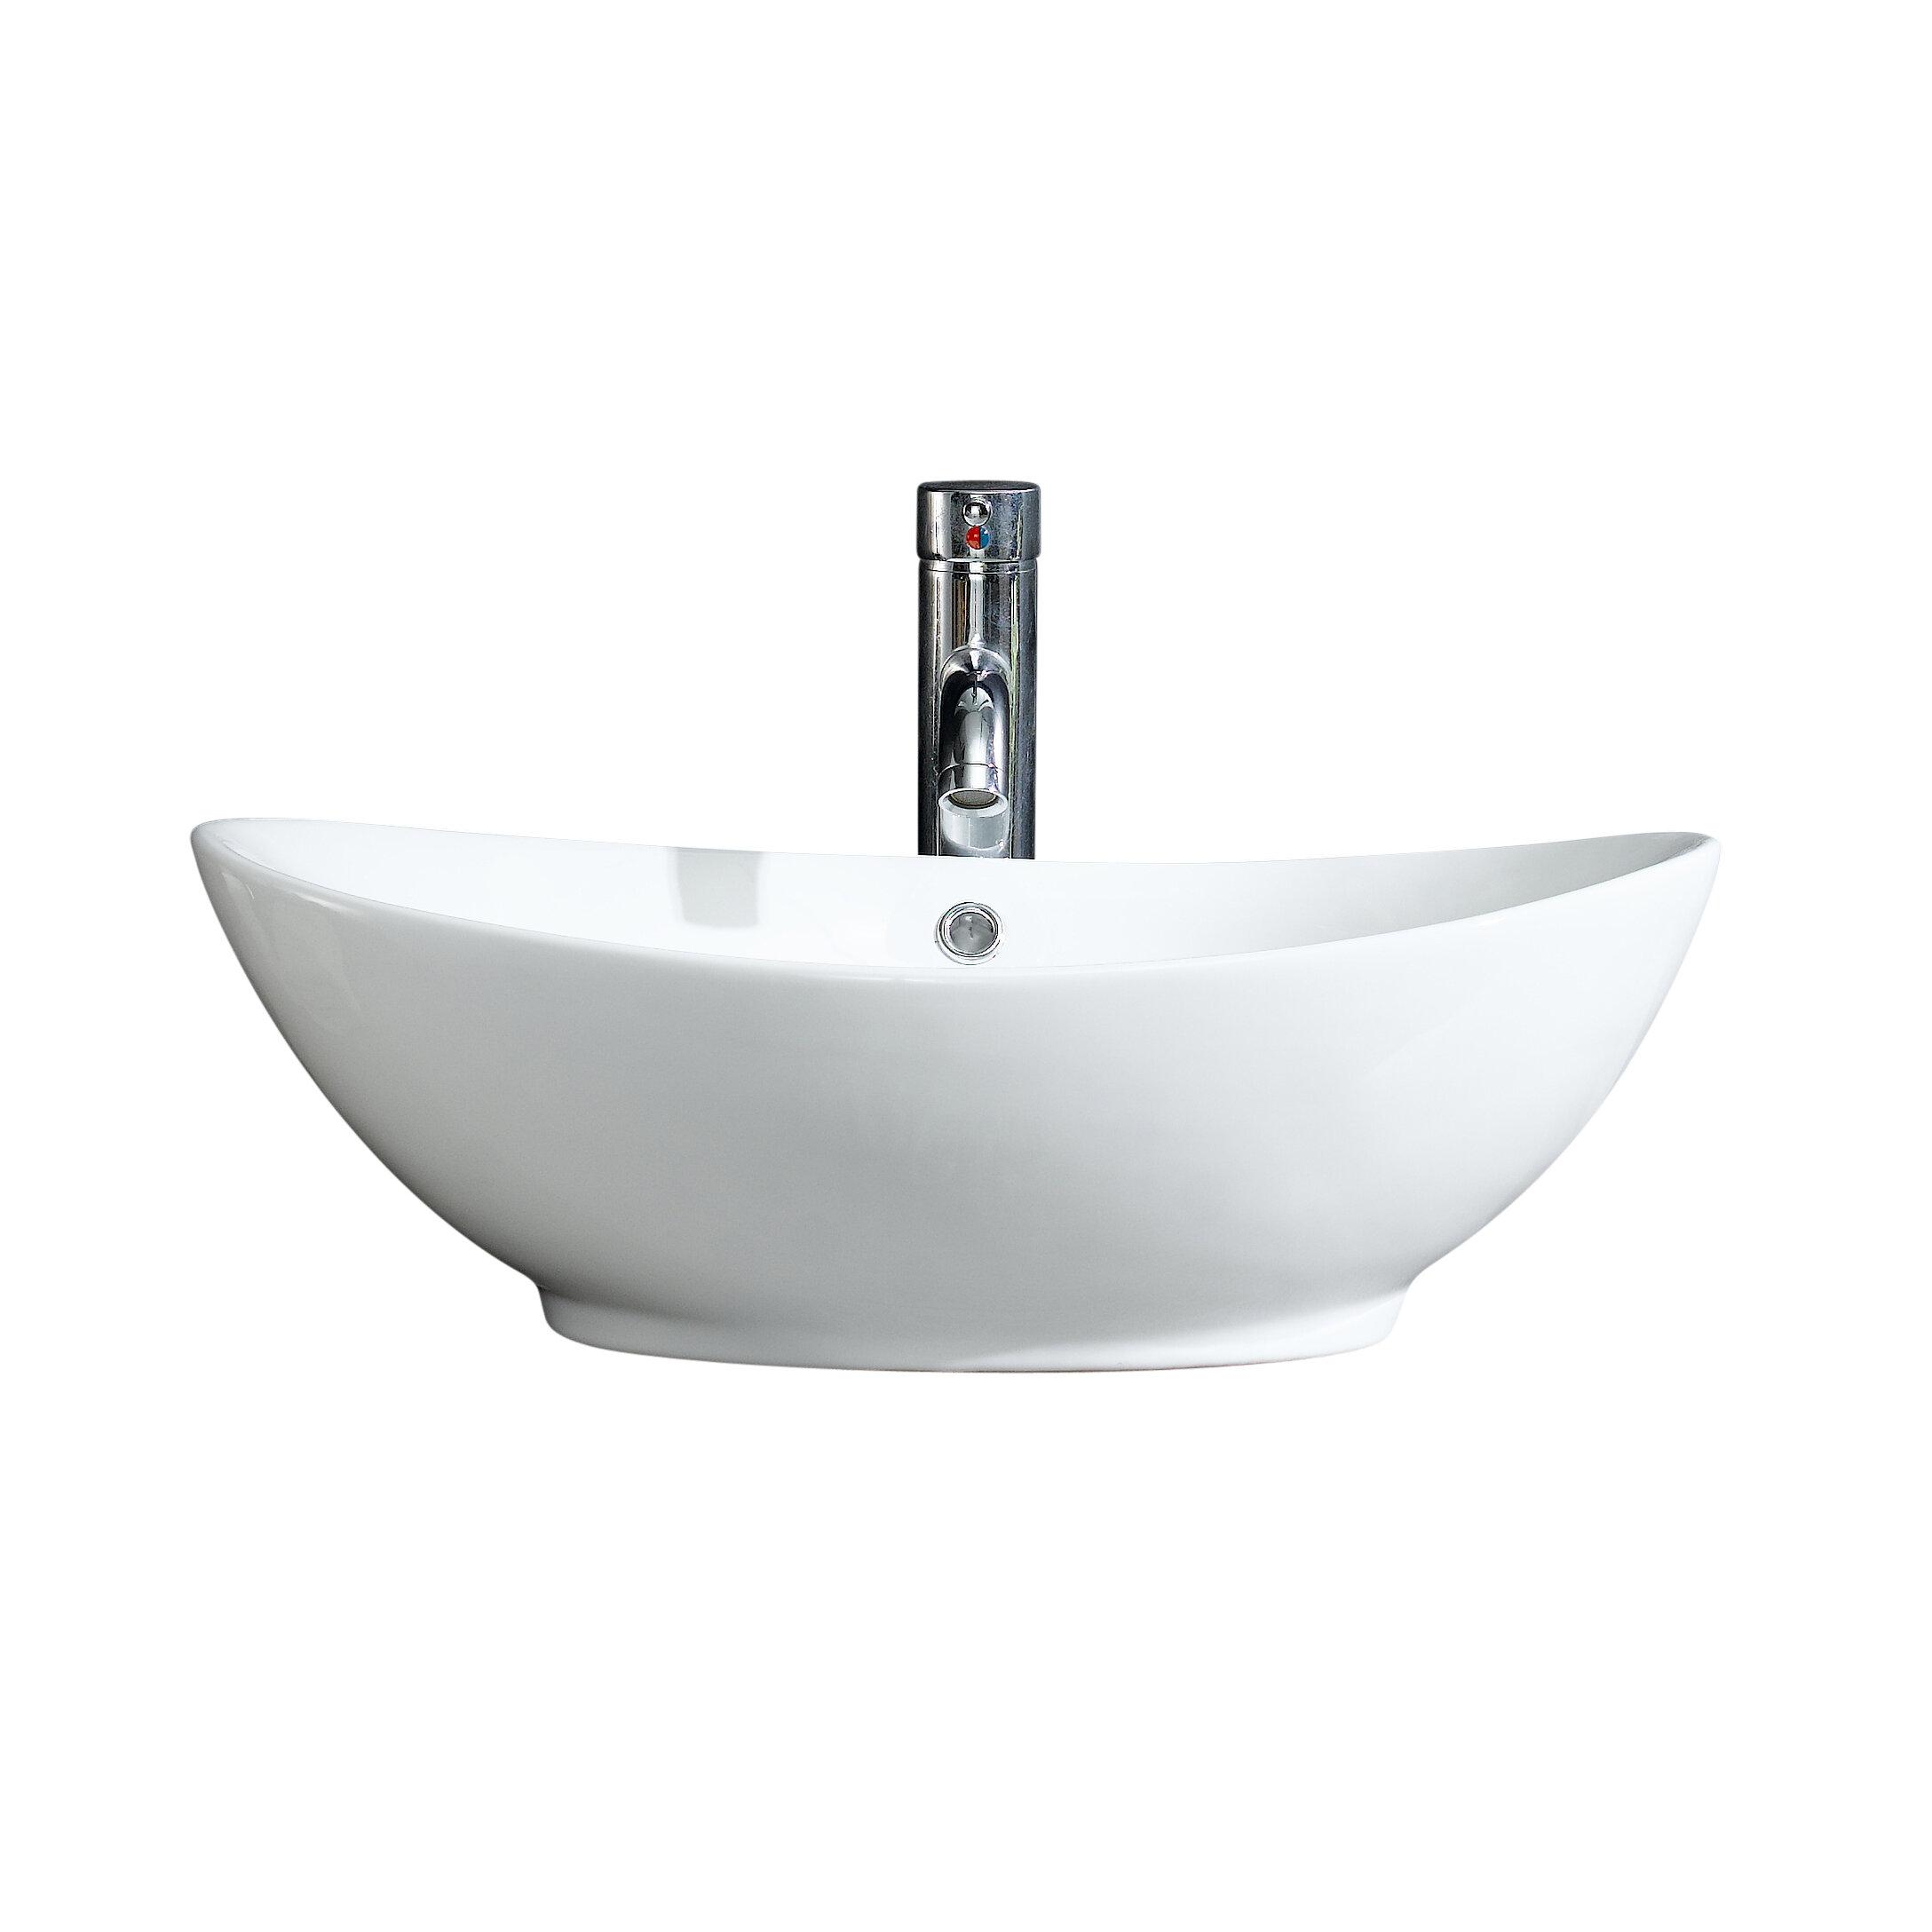 Fine Fixtures Modern Ceramic Oval Vessel Bathroom Sink With Overflow Reviews Wayfair